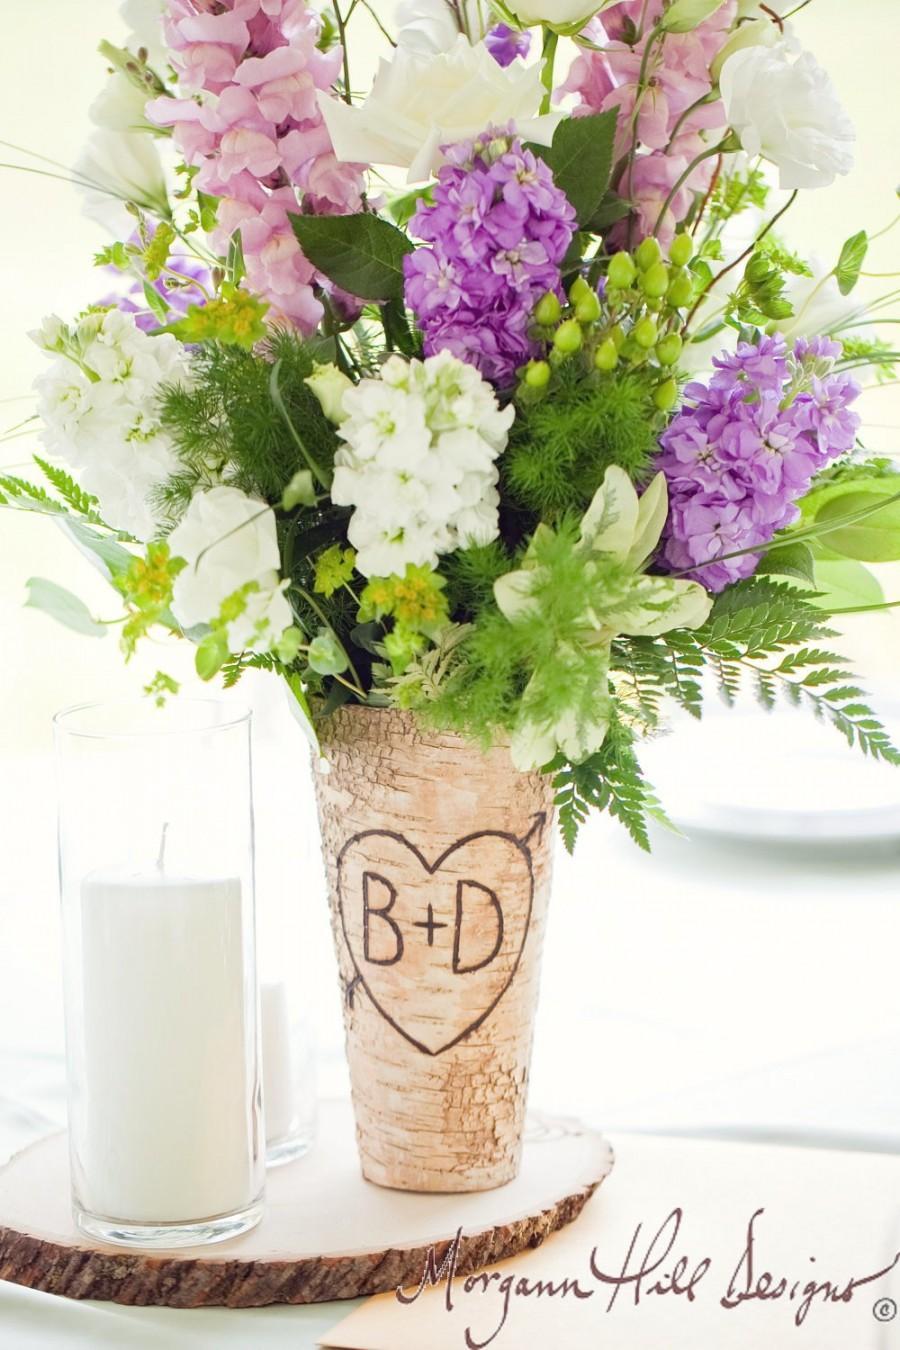 Mariage - Personalized  Birch Bark Centerpiece Vase Rustic Wedding (Item Number 140166)